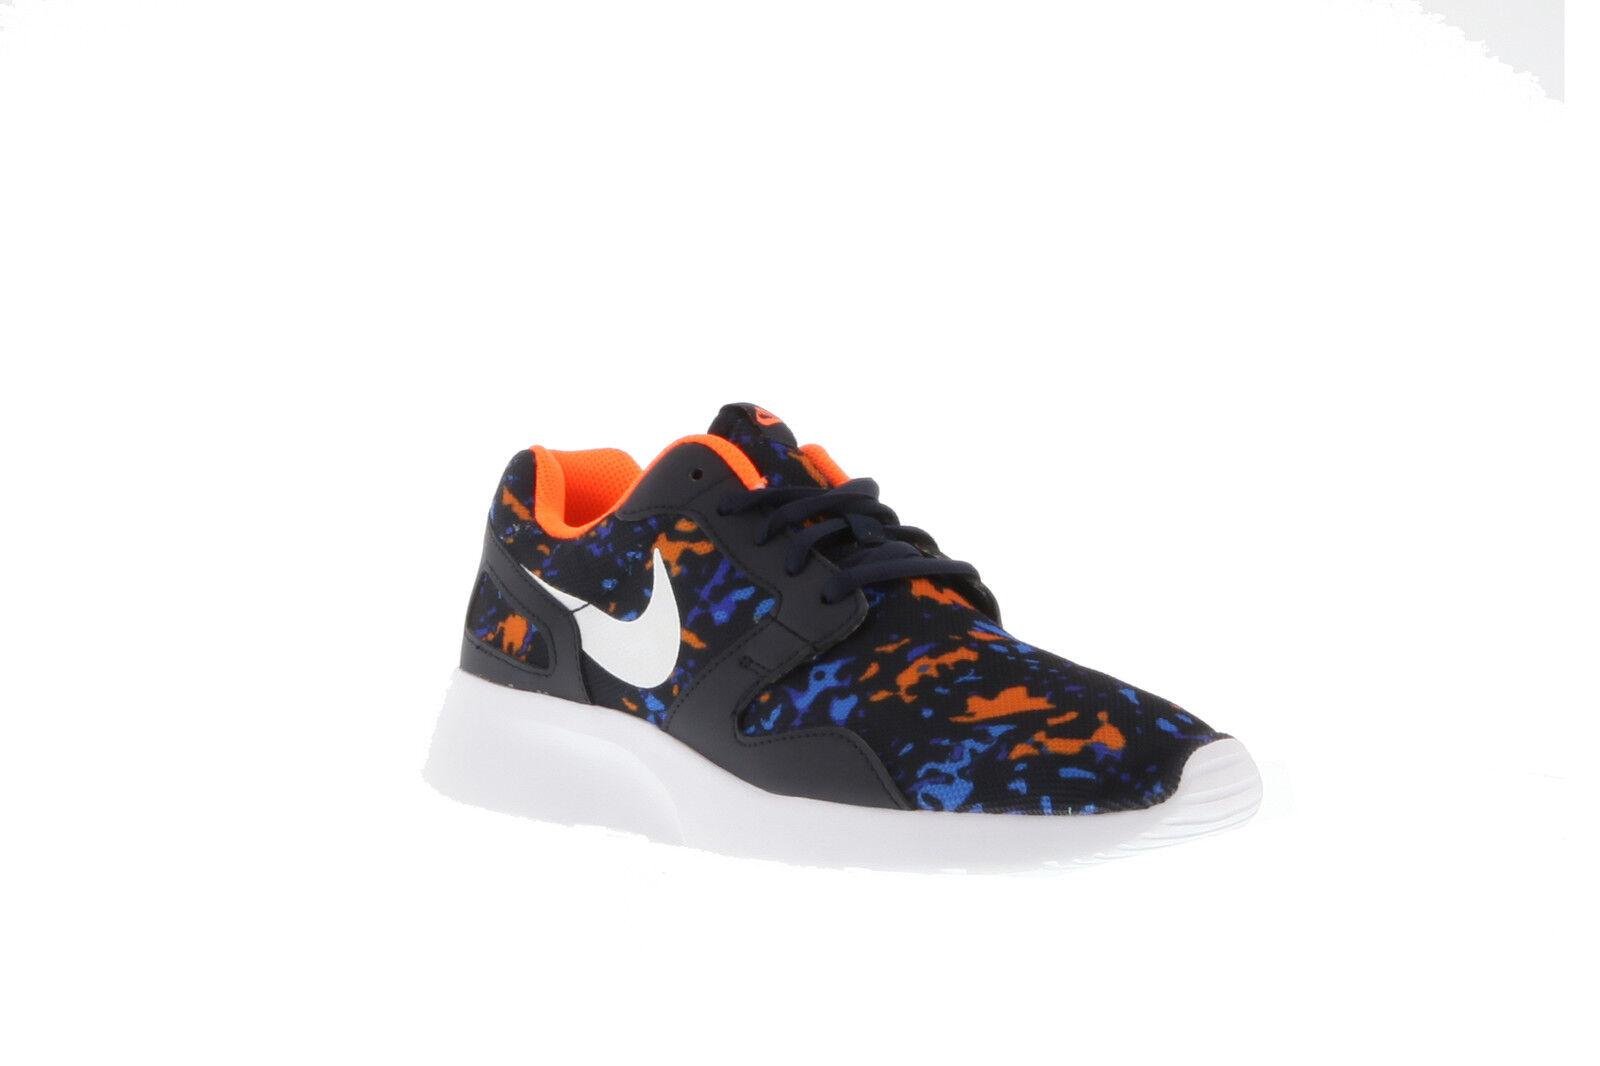 Brand New 100% Authentic Nike Kaishi Print Sneakers (705450-418) Men's Sizes